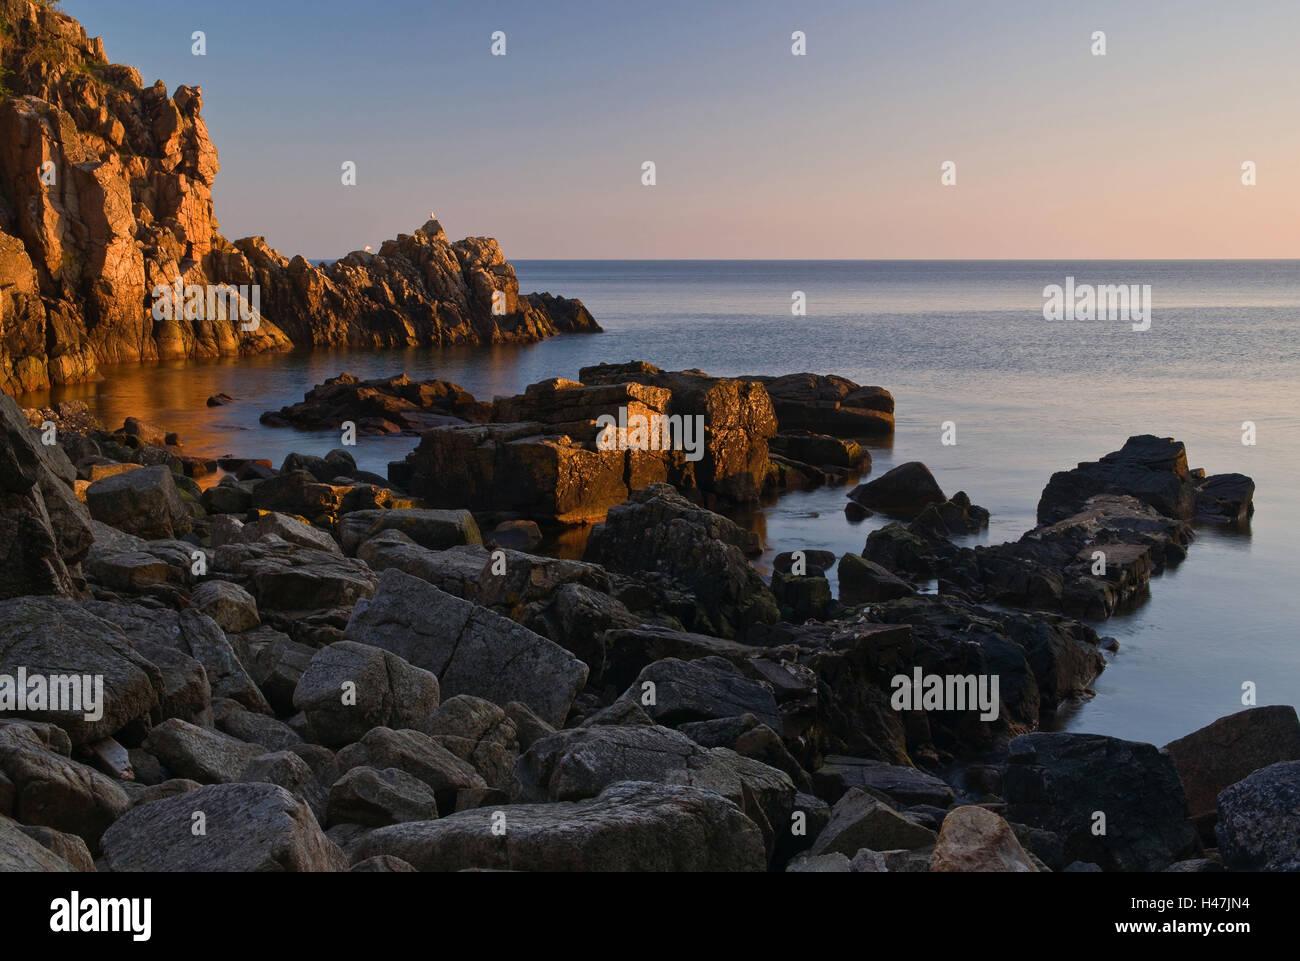 Denmark, bile coast island Bornholm, - Stock Image